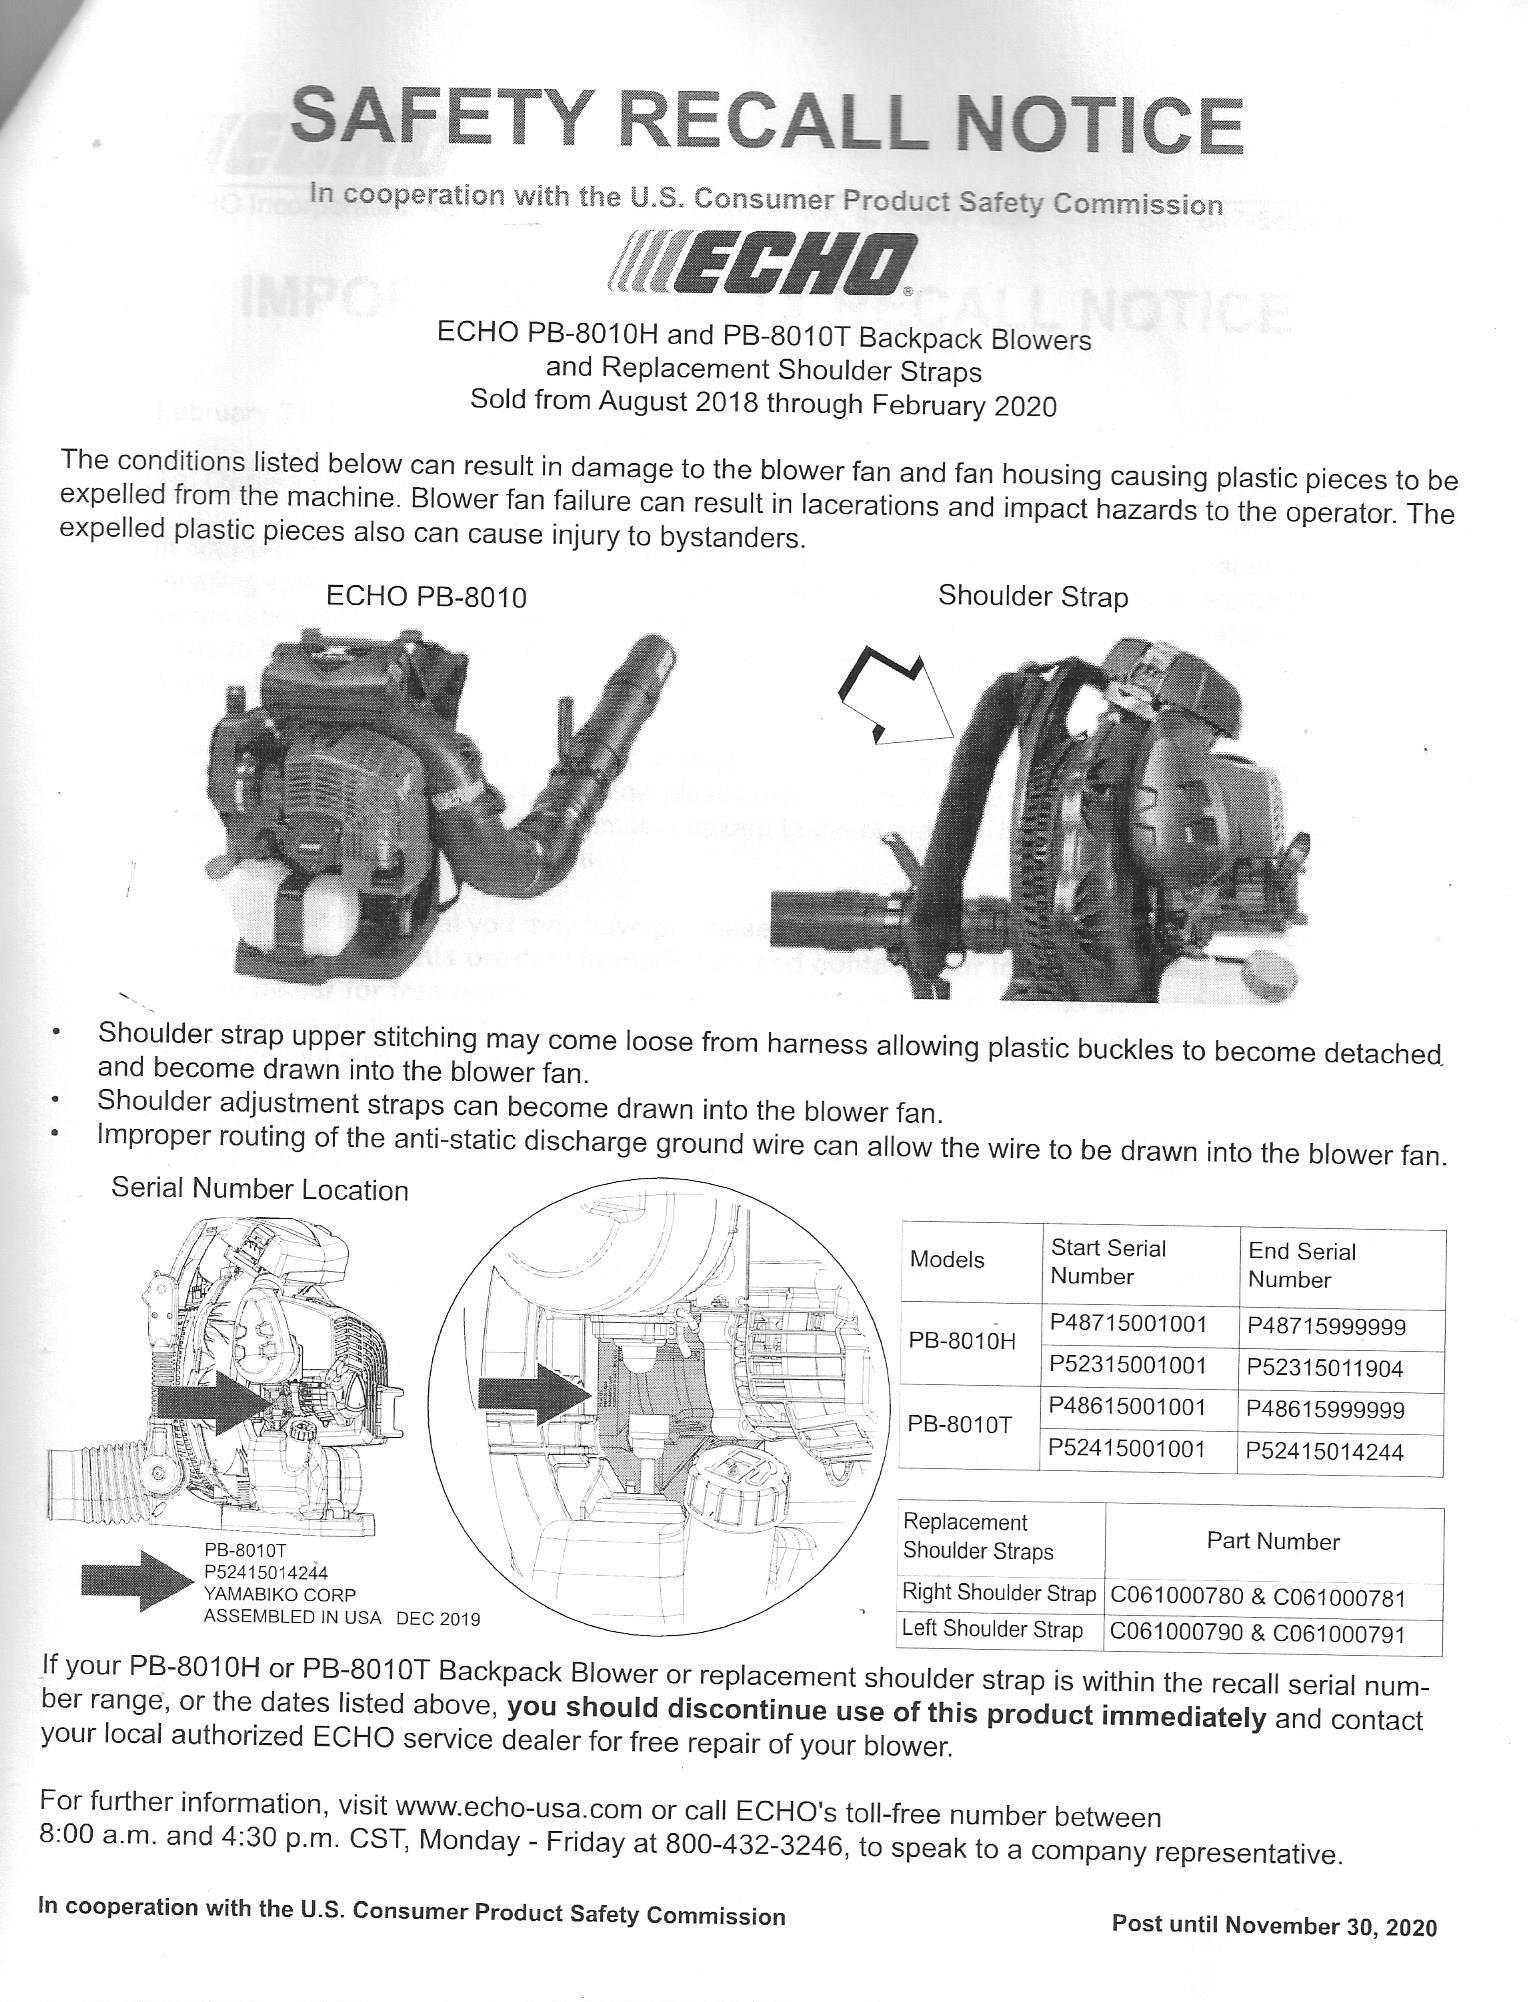 Echo PB-8010T recall, display till November 30, 2020.